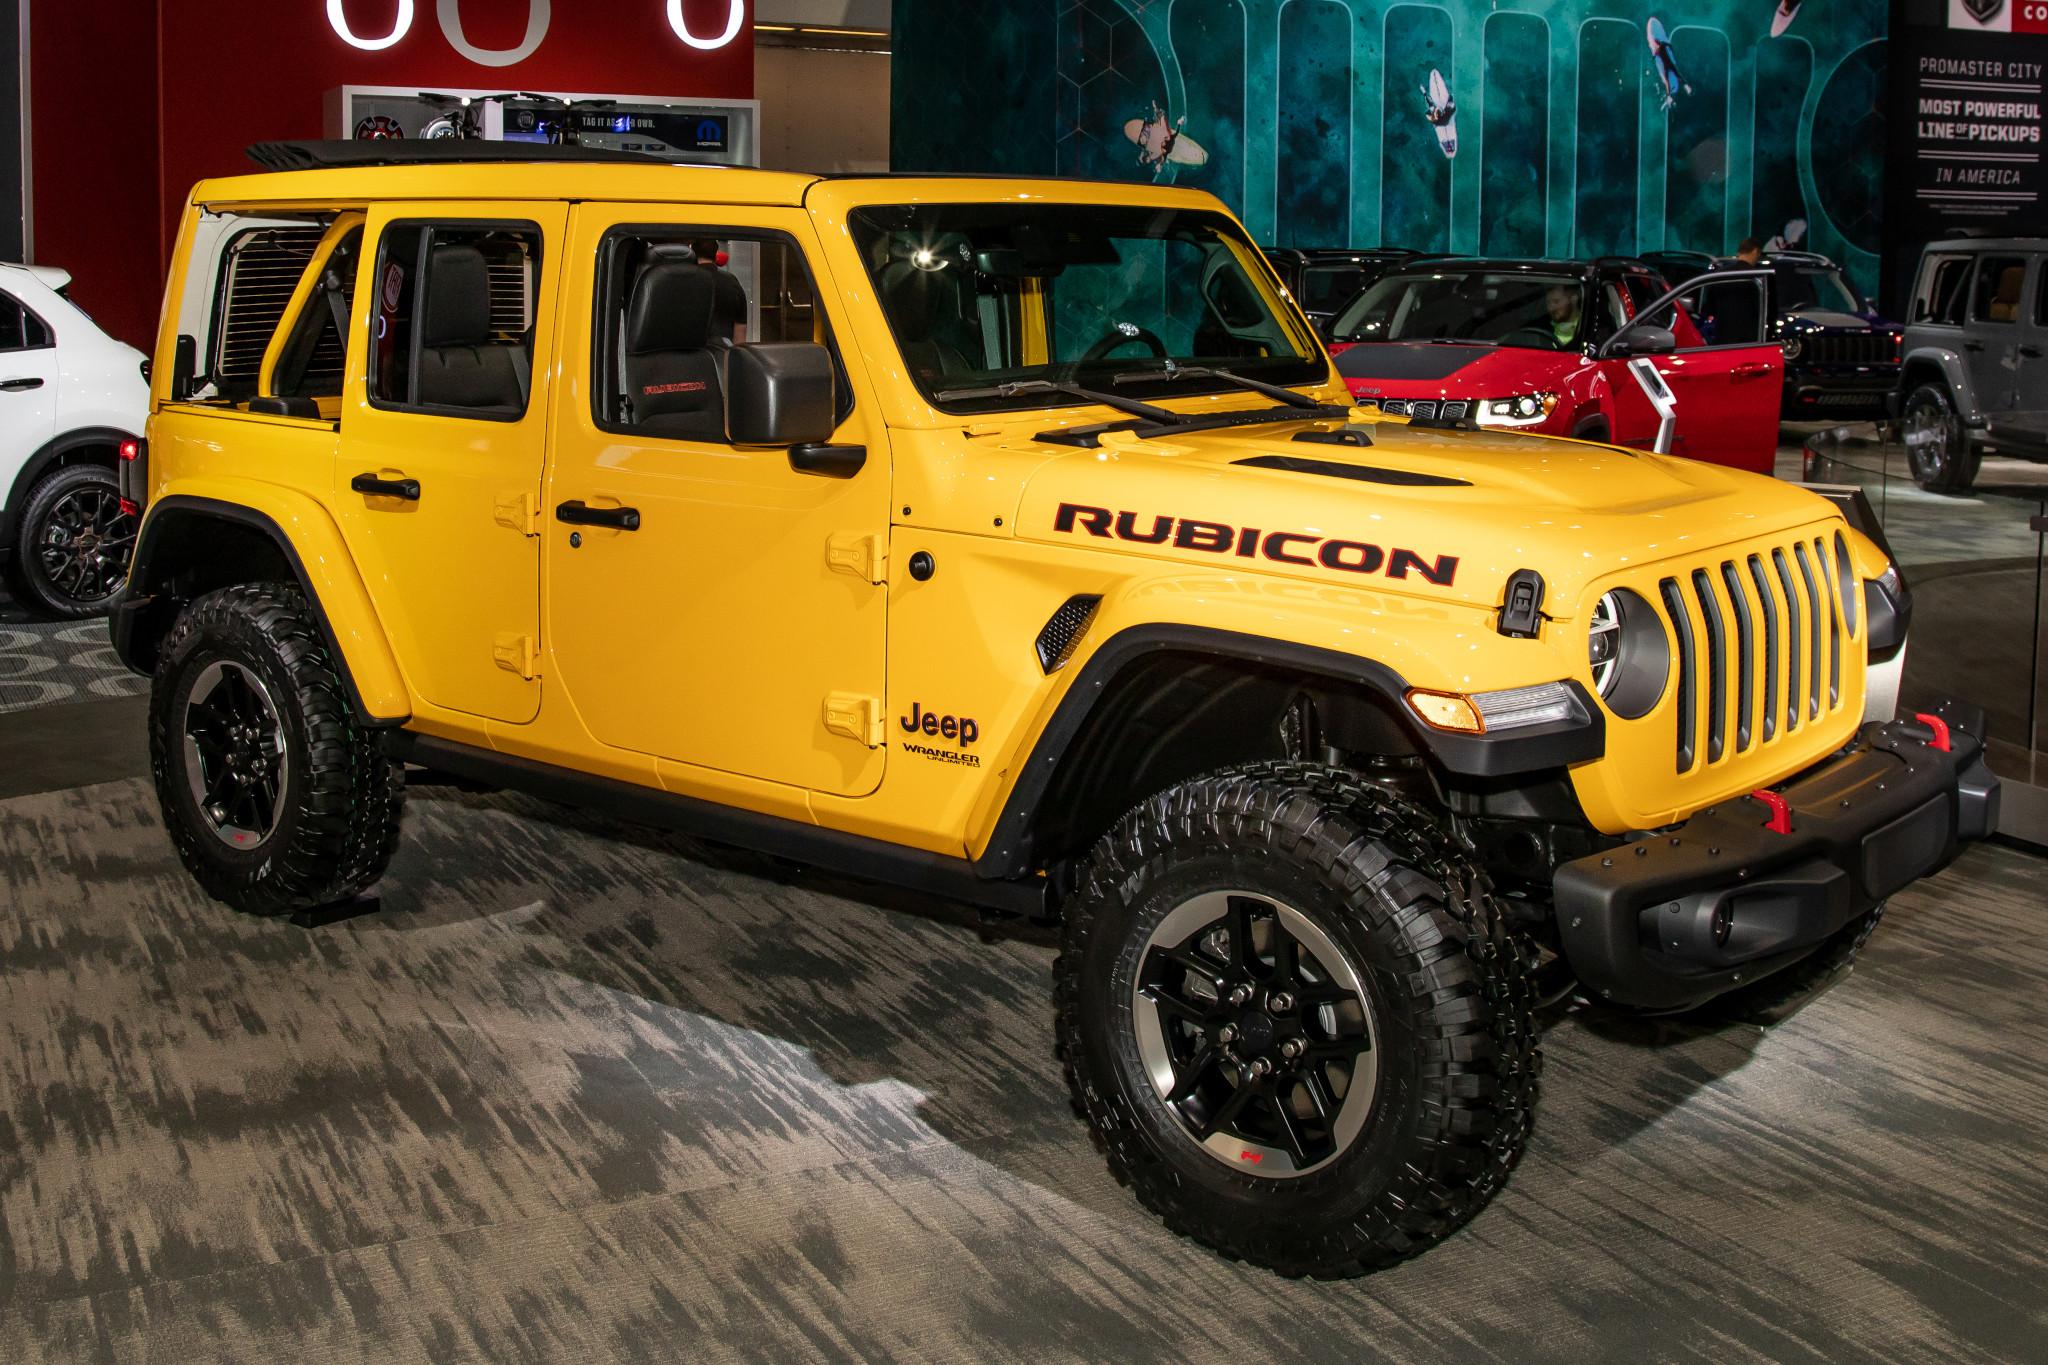 jeep-wrangler-2020-01-angle--exterior--front--yellow.jpg